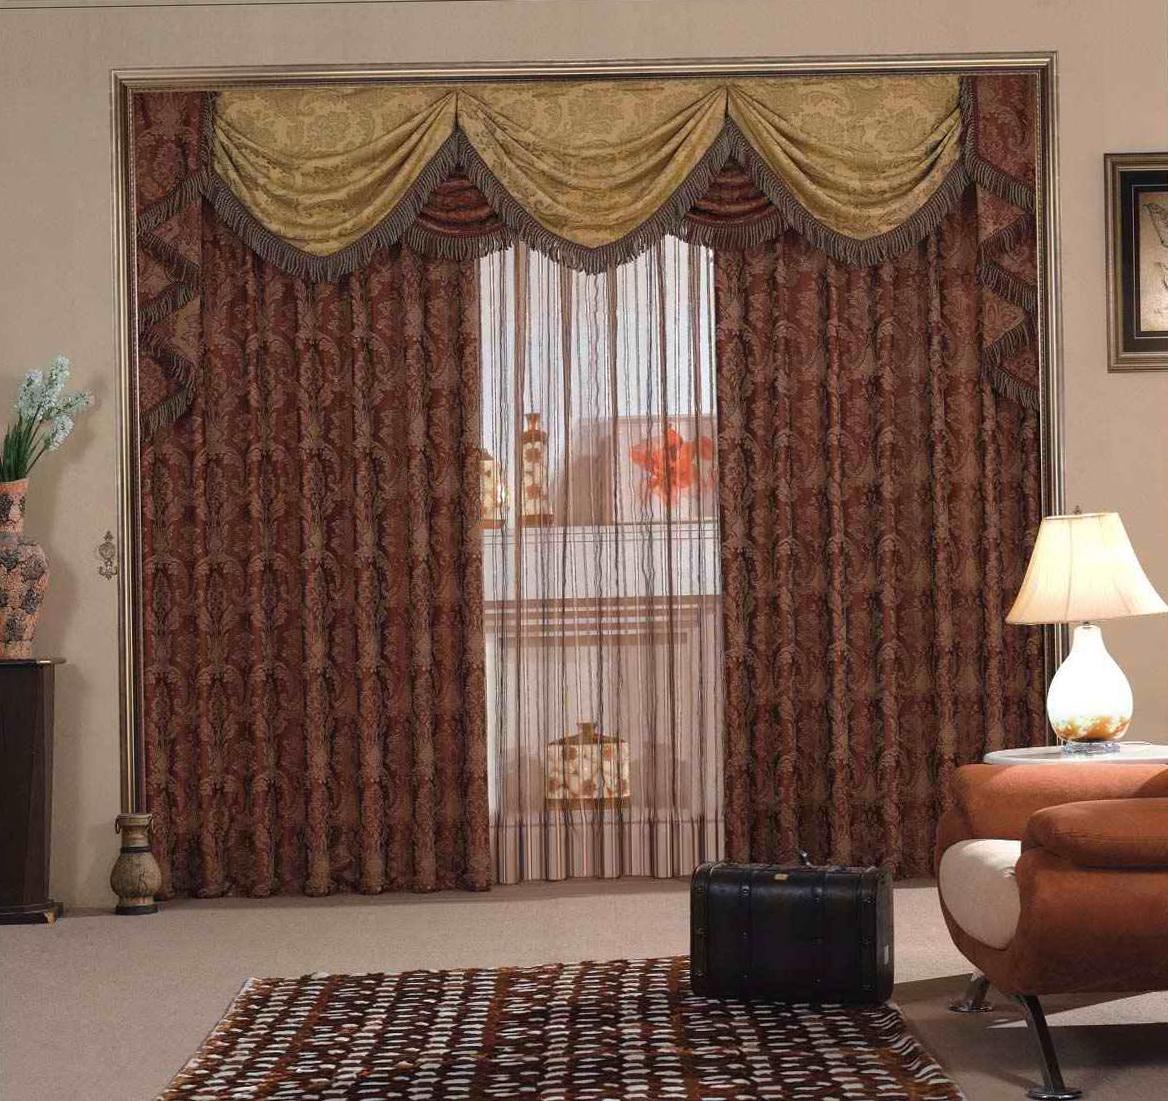 Fire Retardant Curtains For Restaurants Home Design Ideas